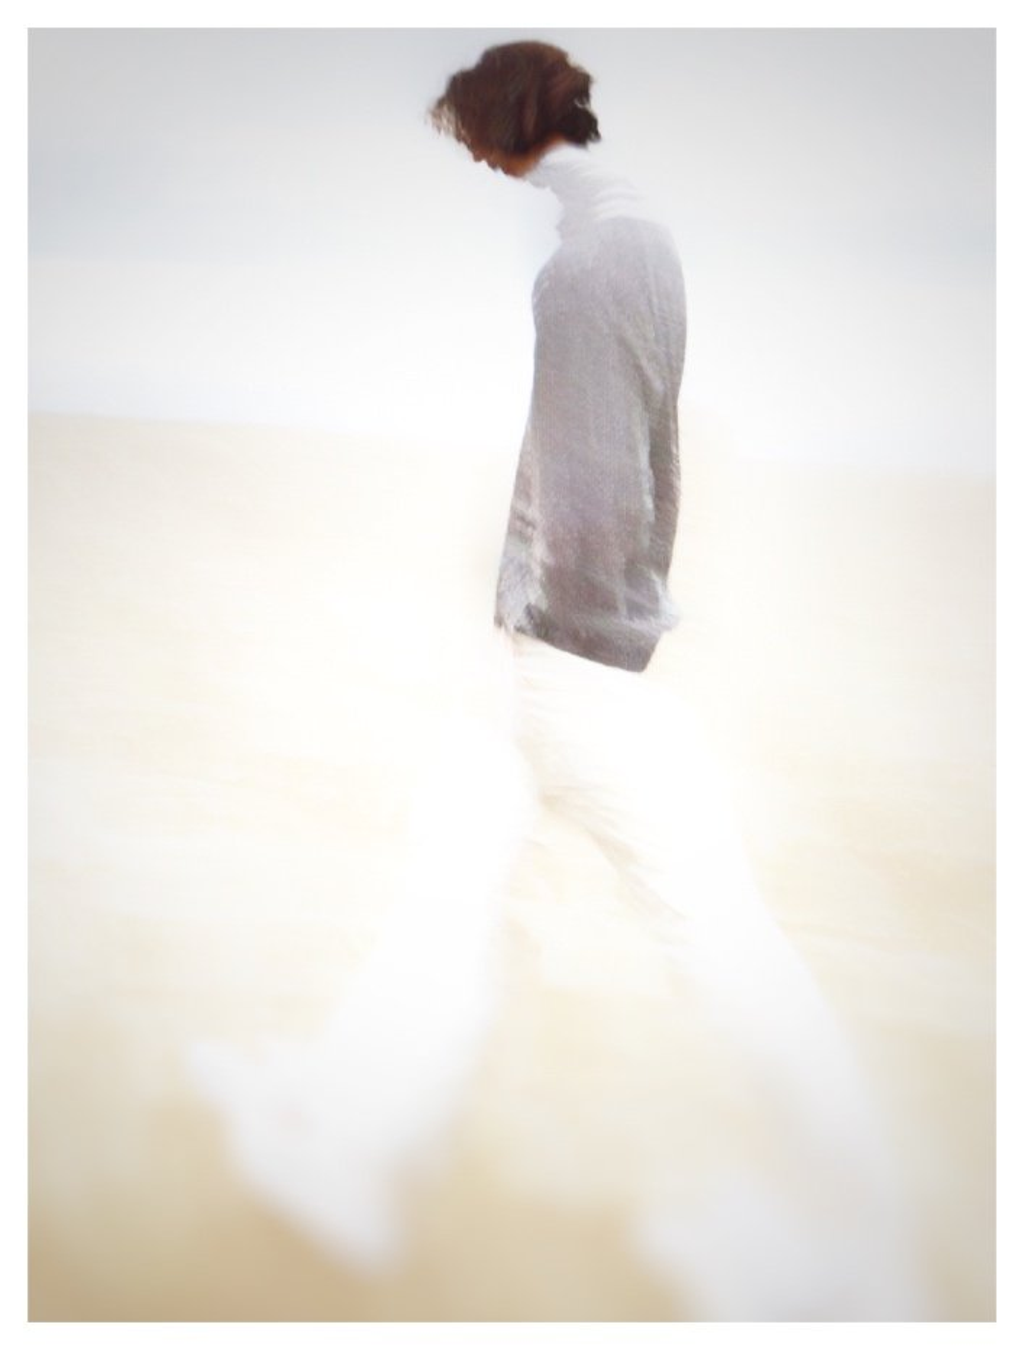 Just walking— no talking by joemuli